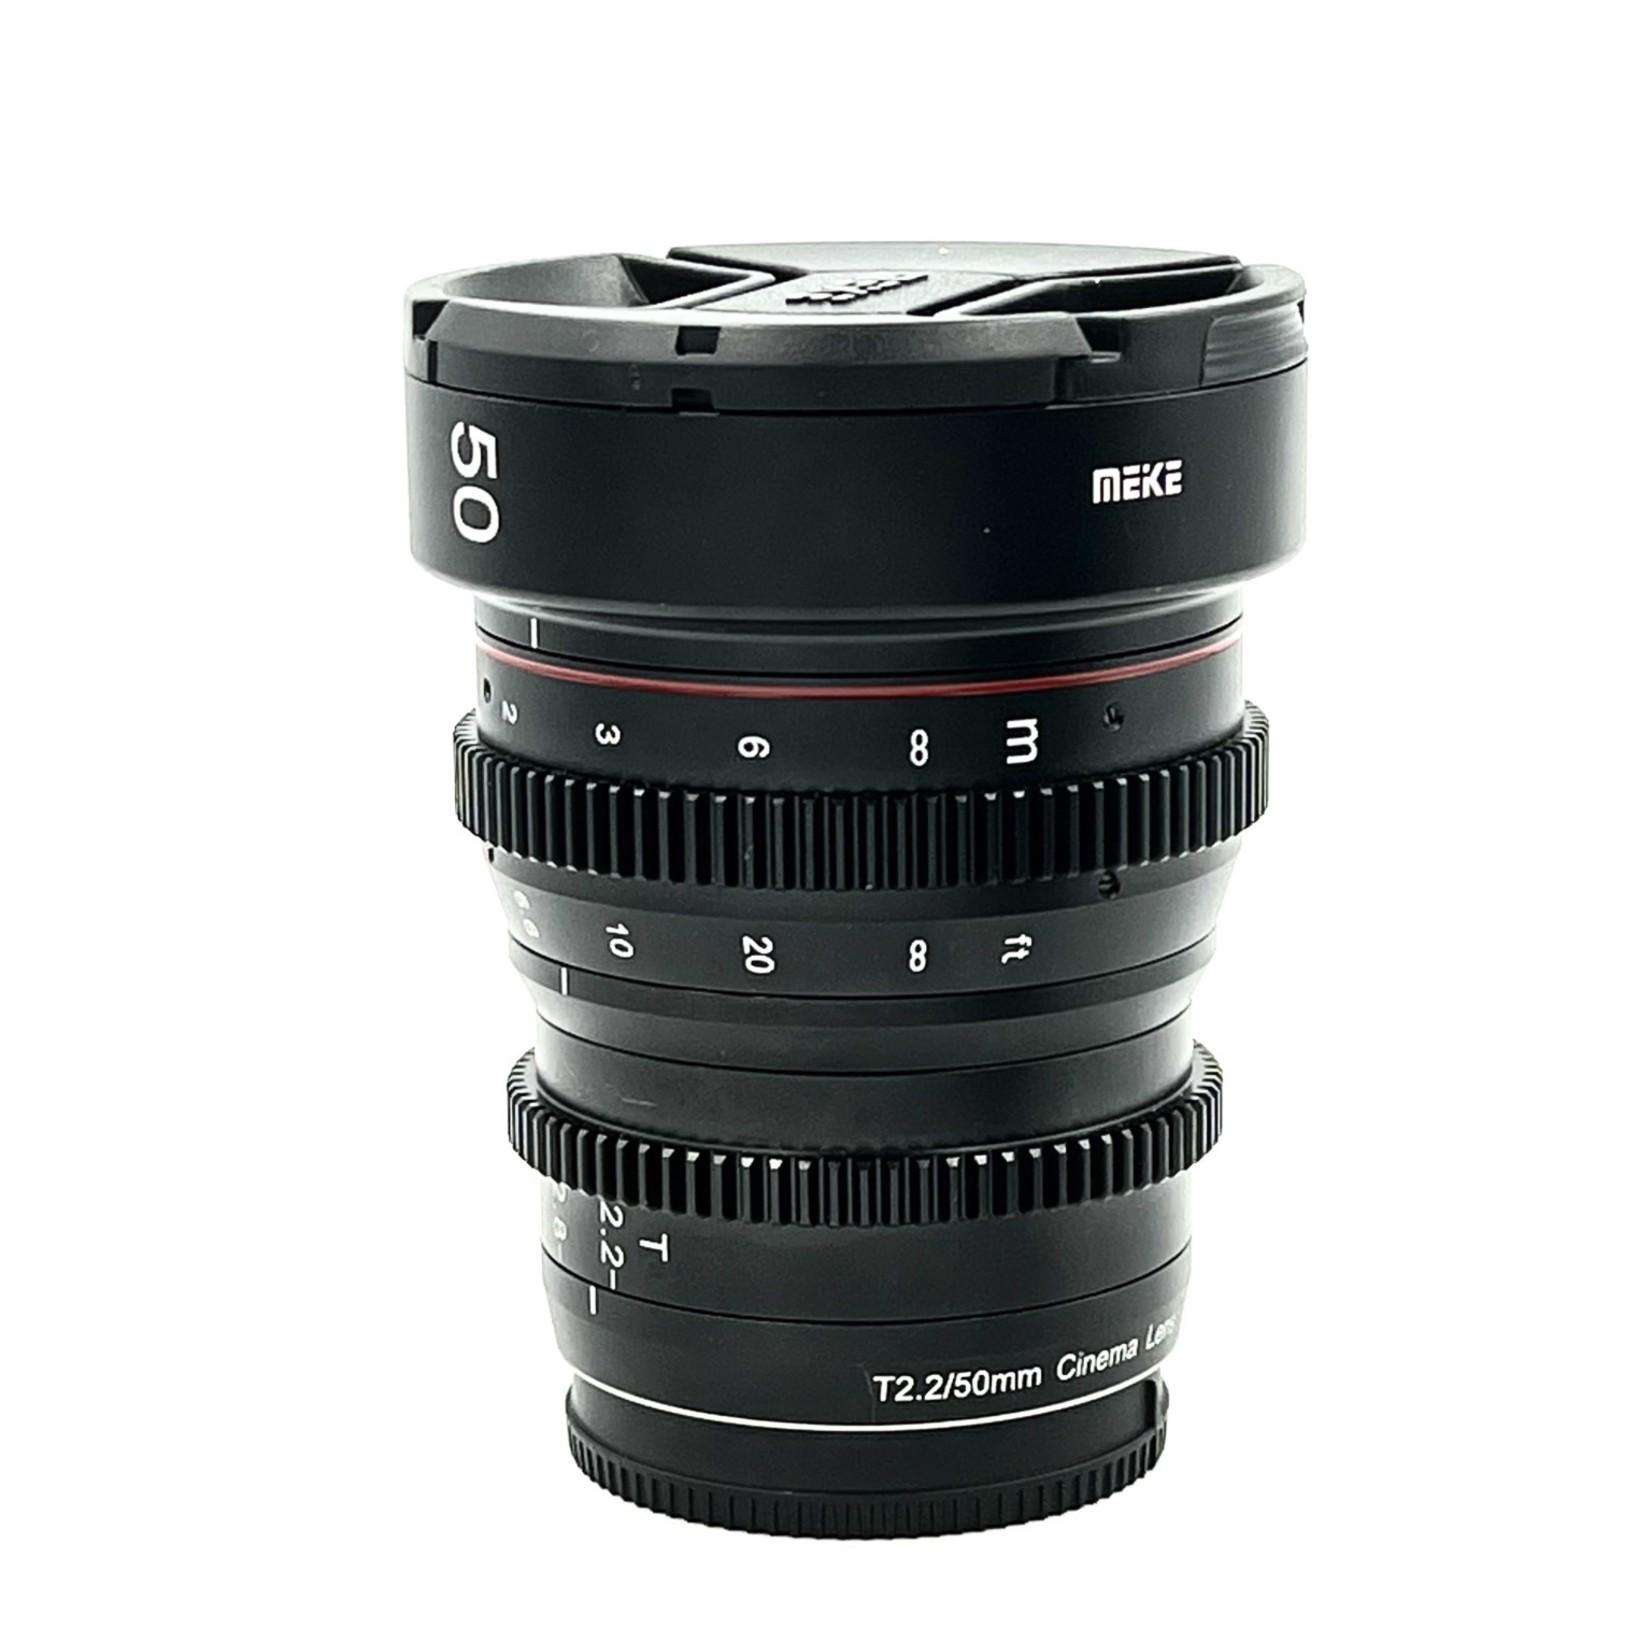 Panasonic Meike 50mm T2.2